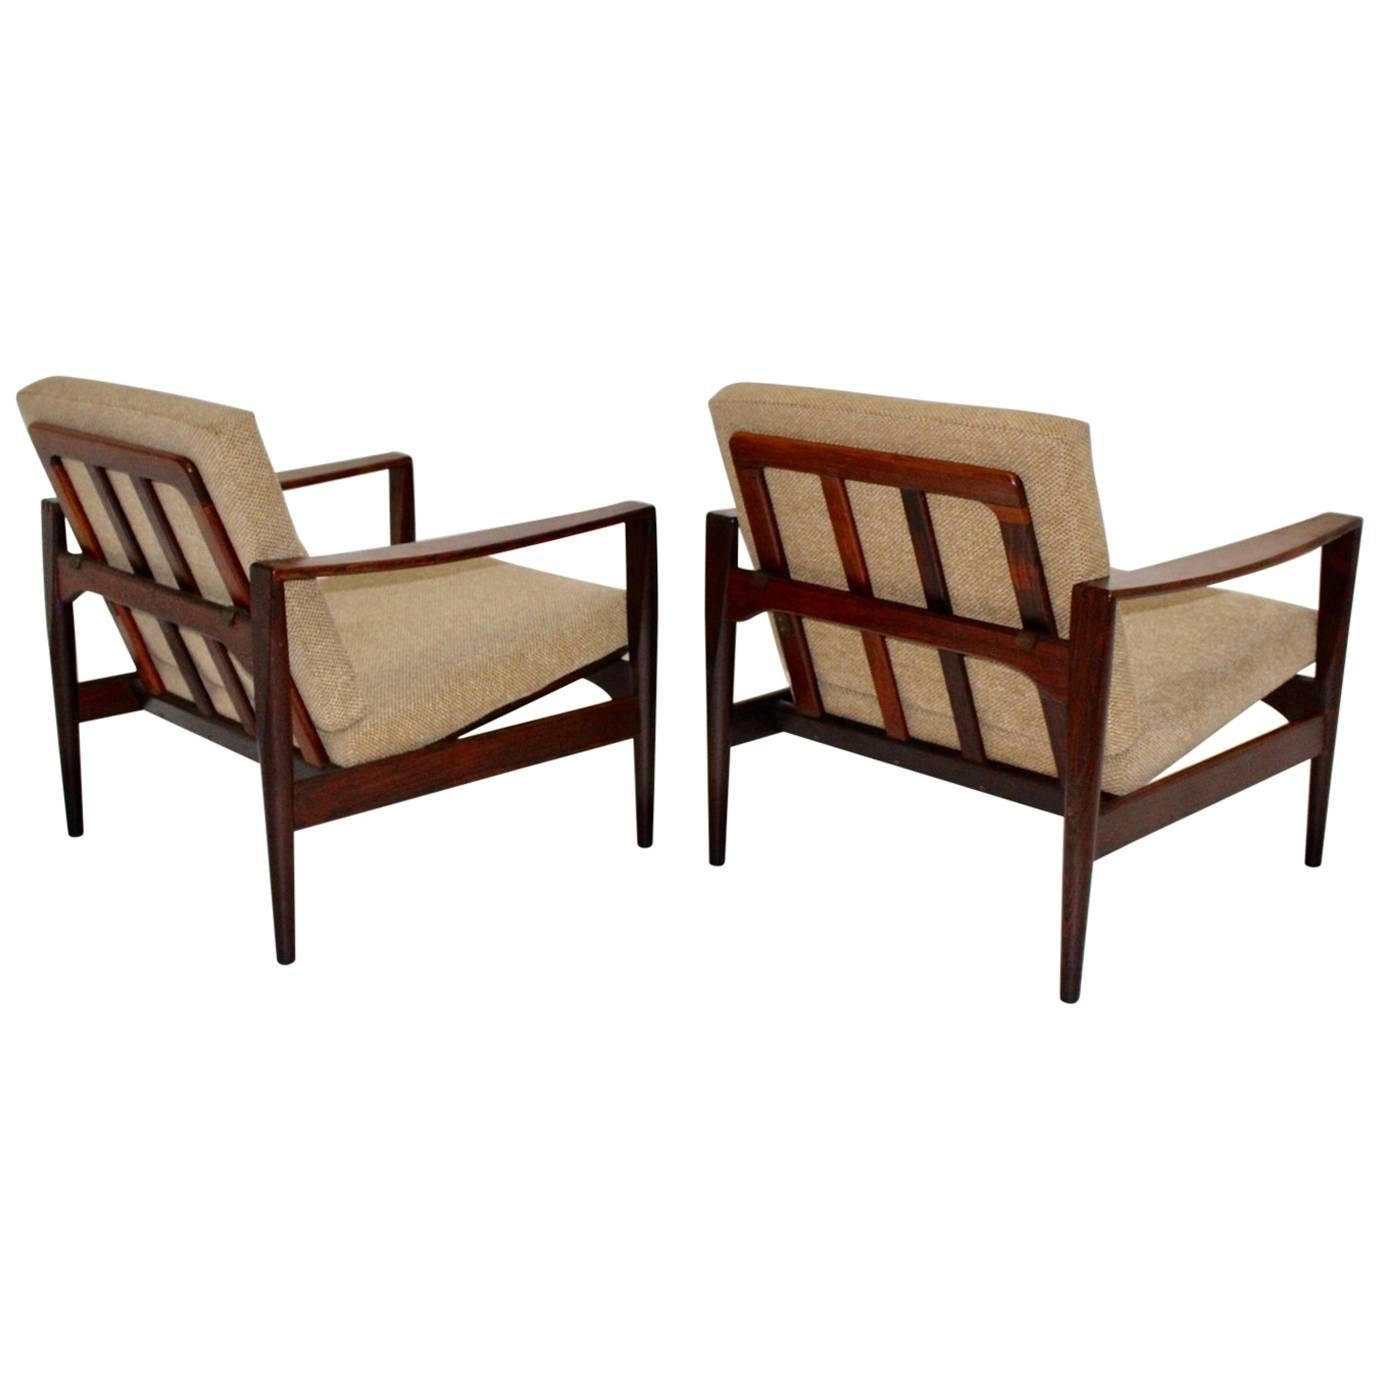 Scandinavian Modern Teak Vintage Lounge Chairs Arne Wahl Iversen, 1960, Denmark